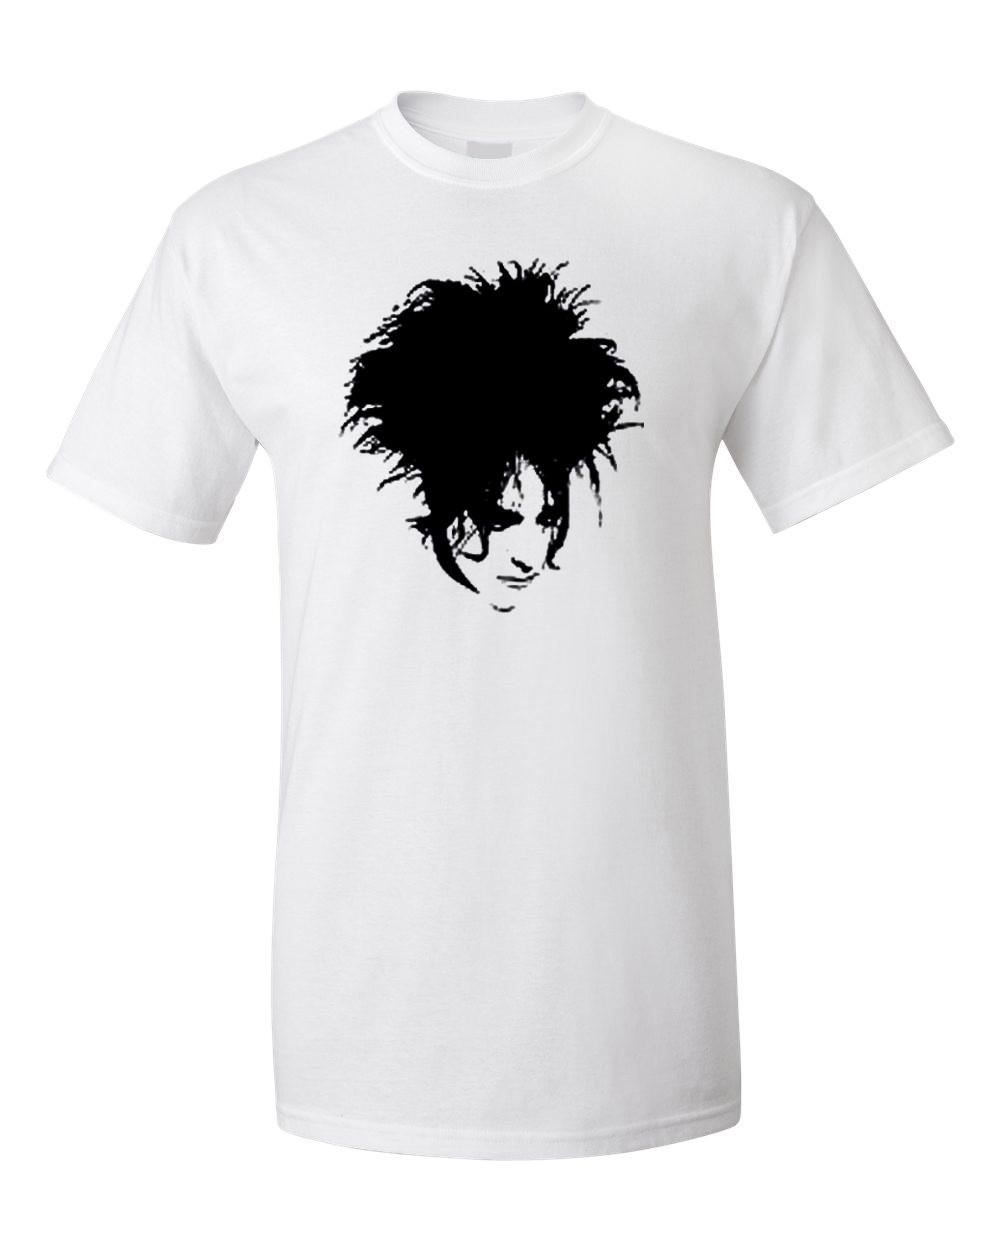 c85661cf6 Robert Smith | The Cure | Post Punk T Shirt - BlackSheepShirts